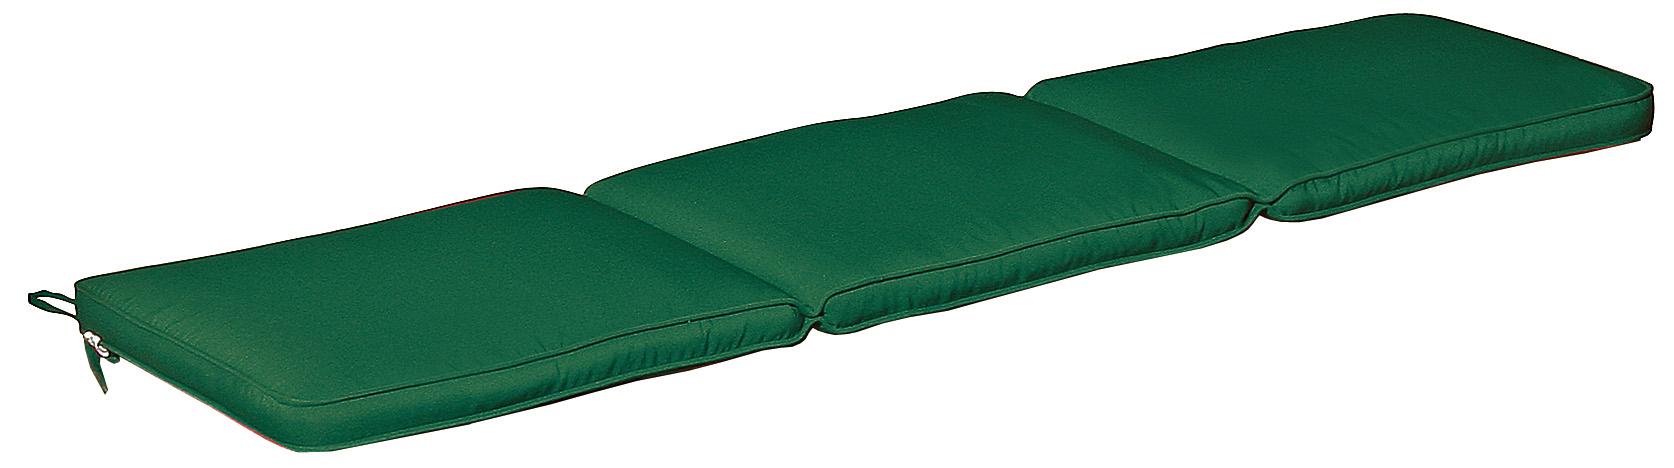 Cuscino per panca con doppia cucitura VERDE